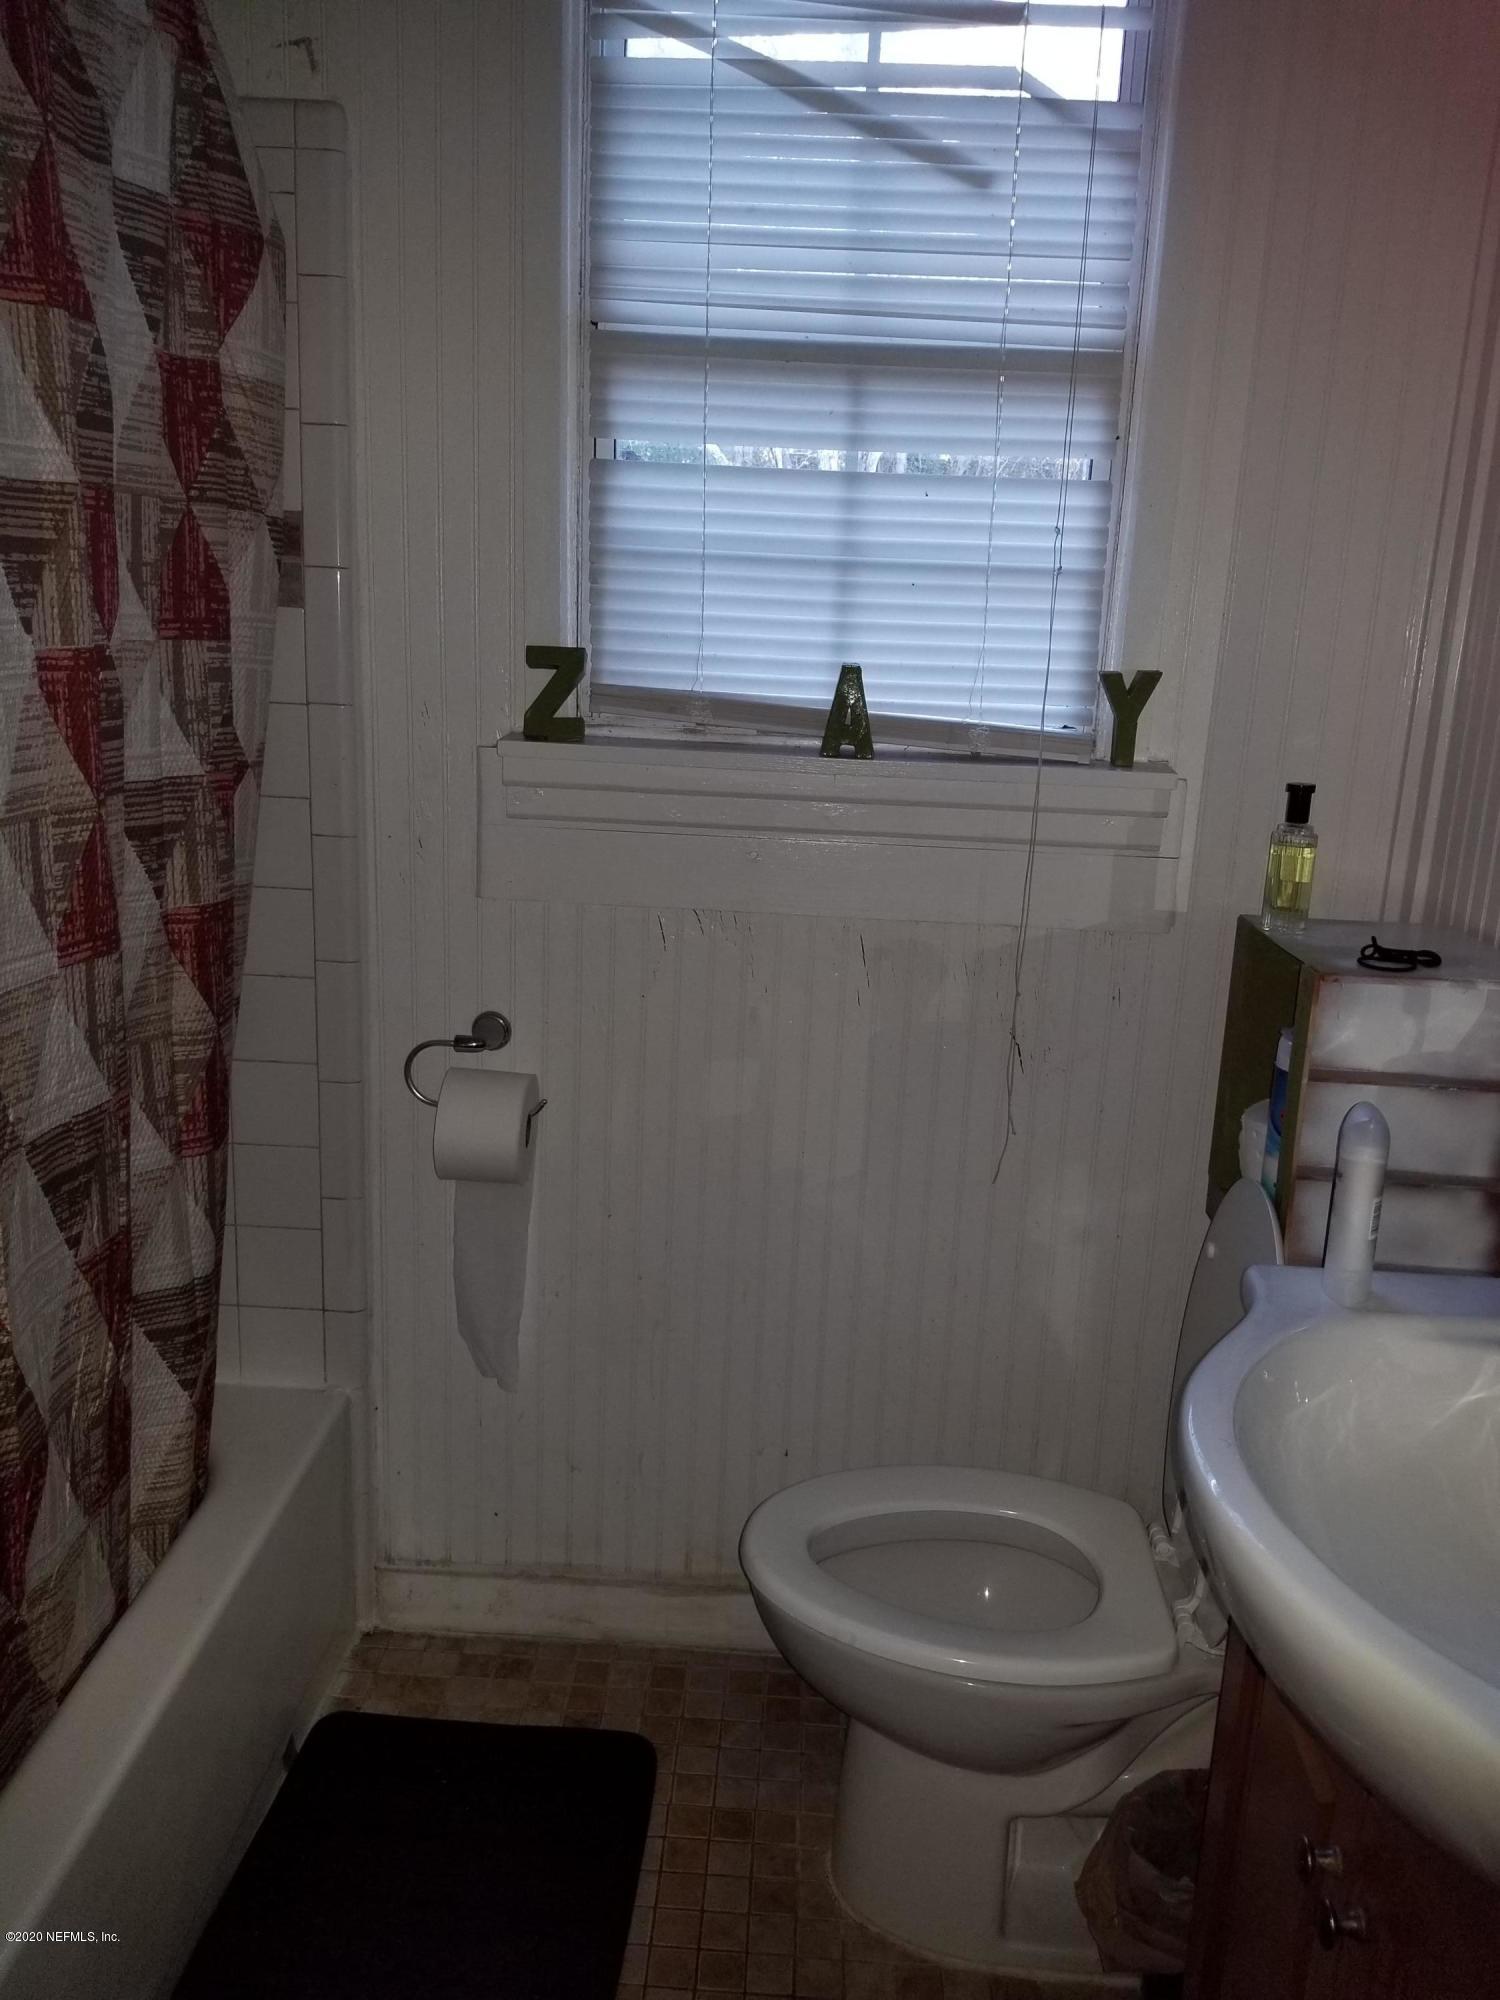 2647 BARRETT, JACKSONVILLE, FLORIDA 32246, 3 Bedrooms Bedrooms, ,2 BathroomsBathrooms,Residential,For sale,BARRETT,1080428